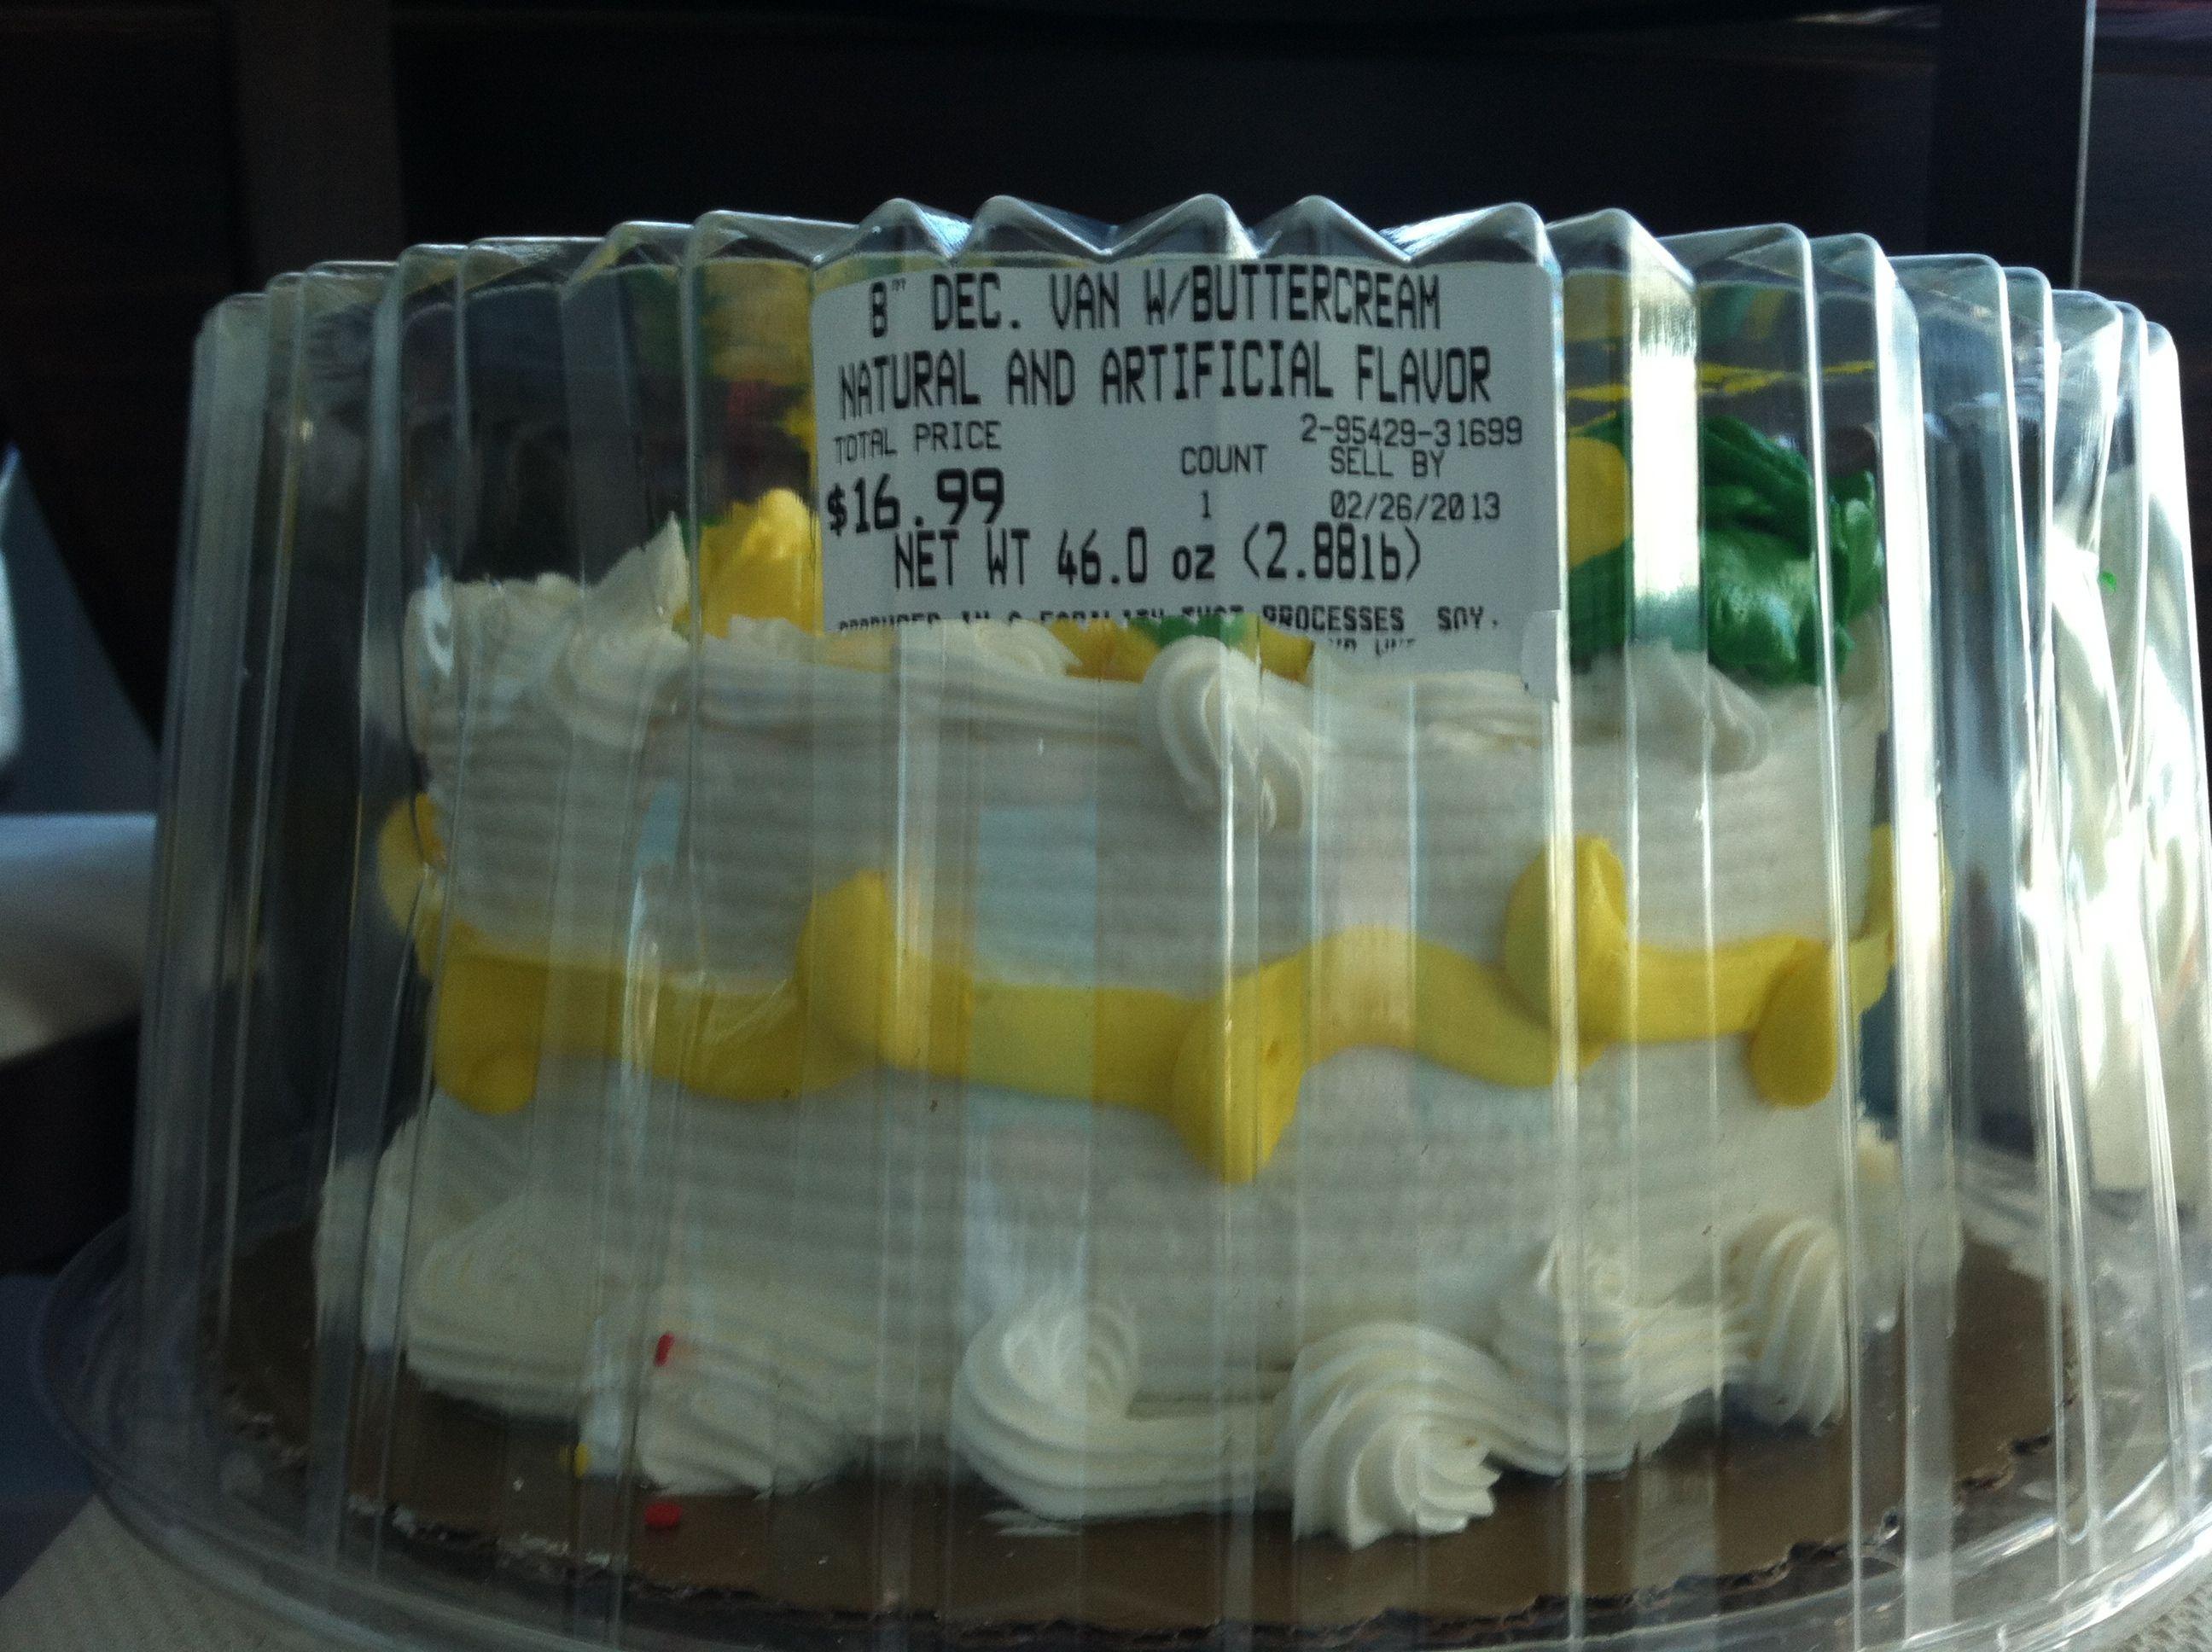 publix birthday cakes 117 BarRestaurant Specials The Secret